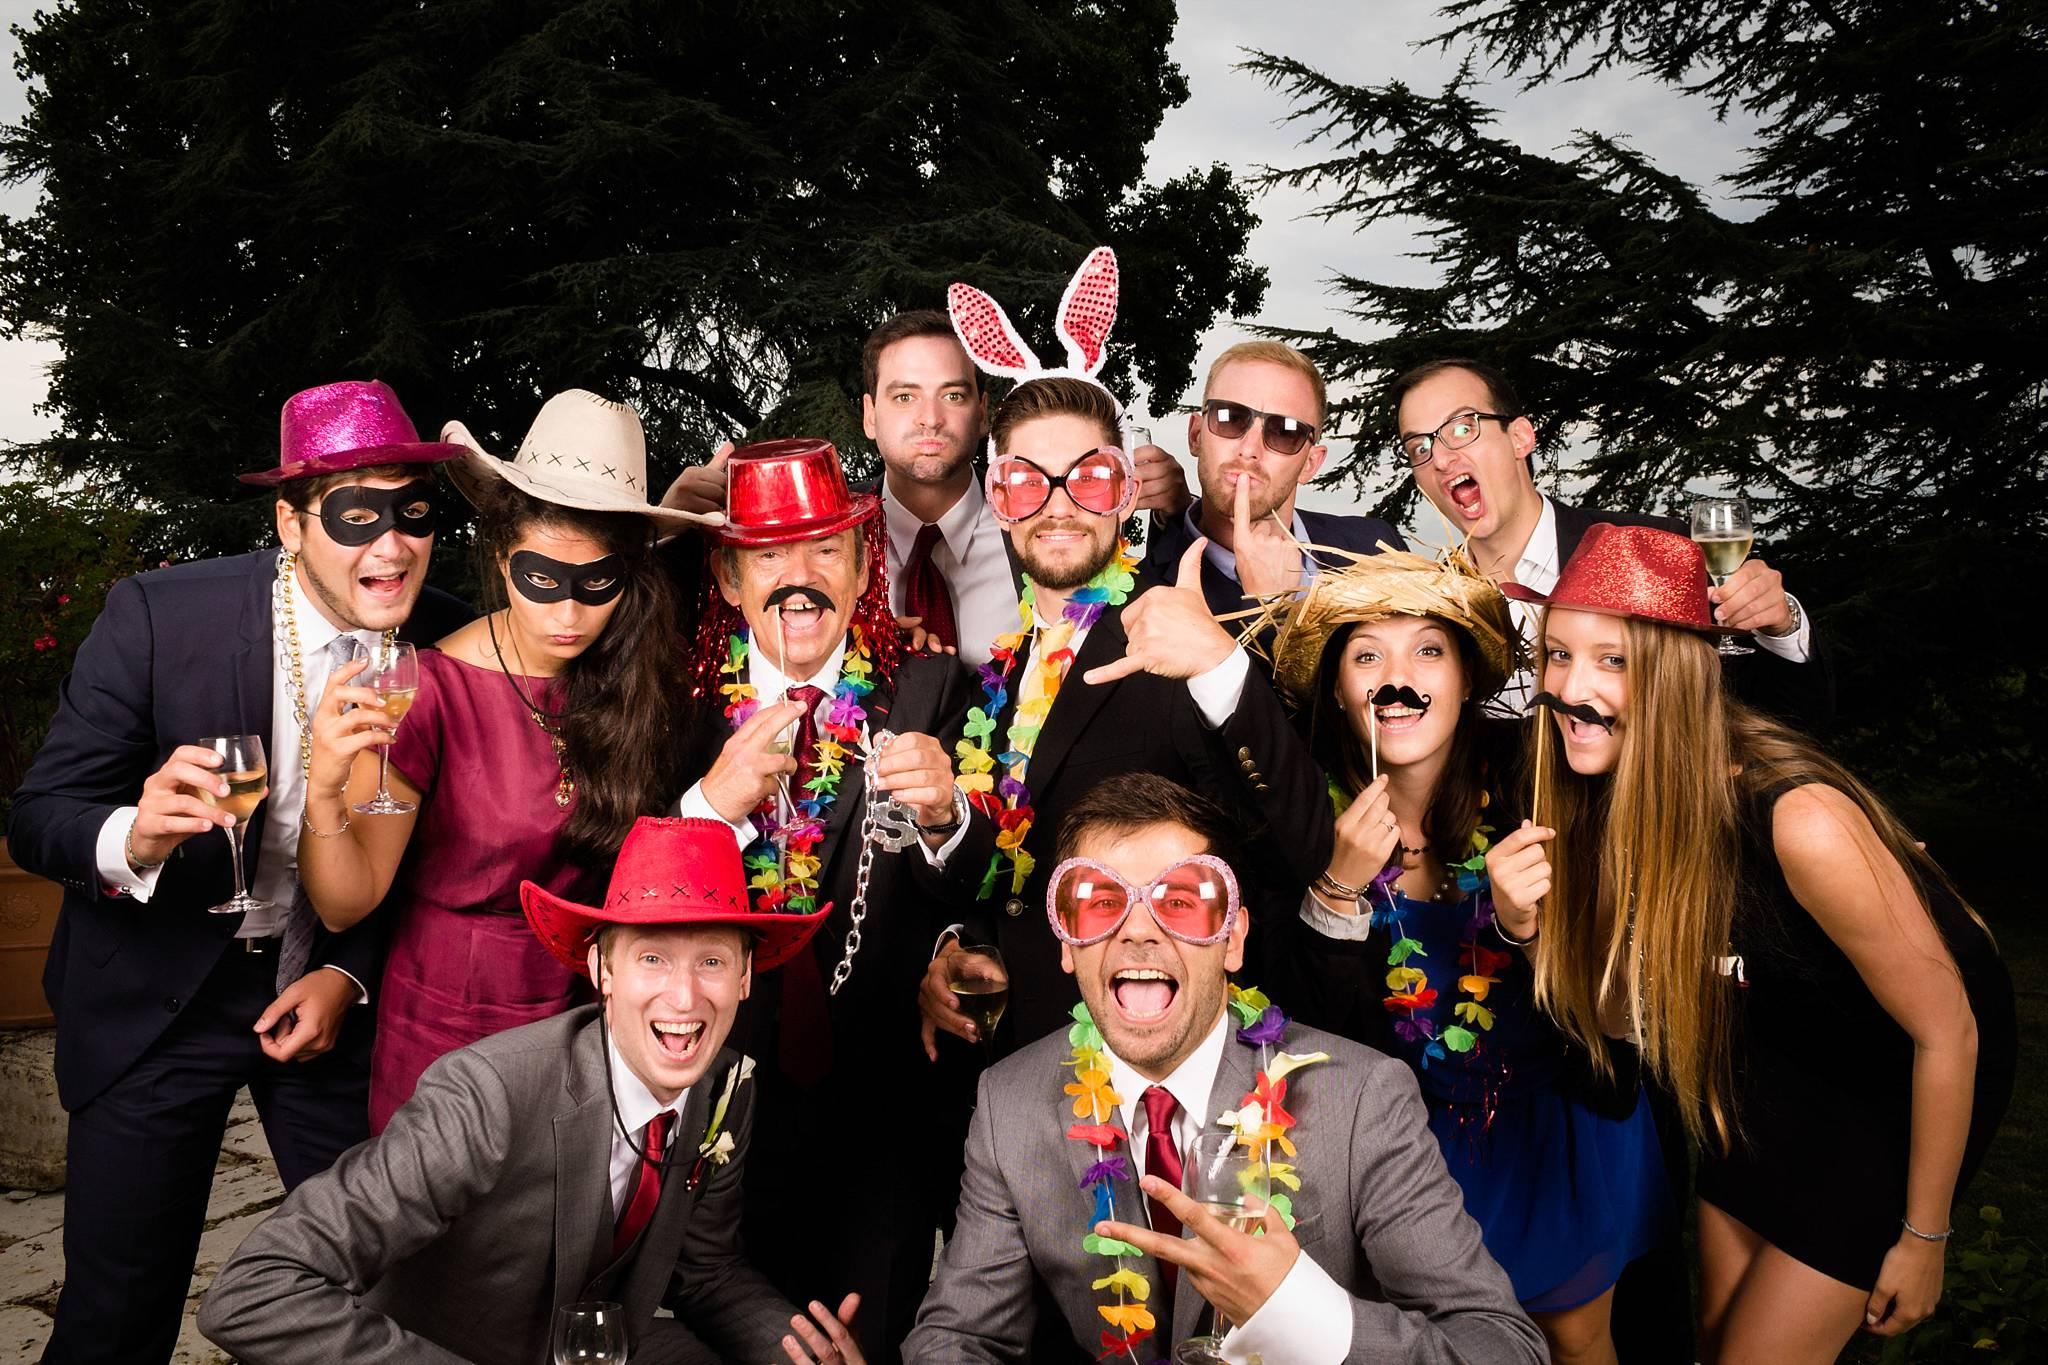 16_photobooth-mariage-bordeaux-gironde-dordogne-charentes-alexandre-roschewitz-photographies_2048px